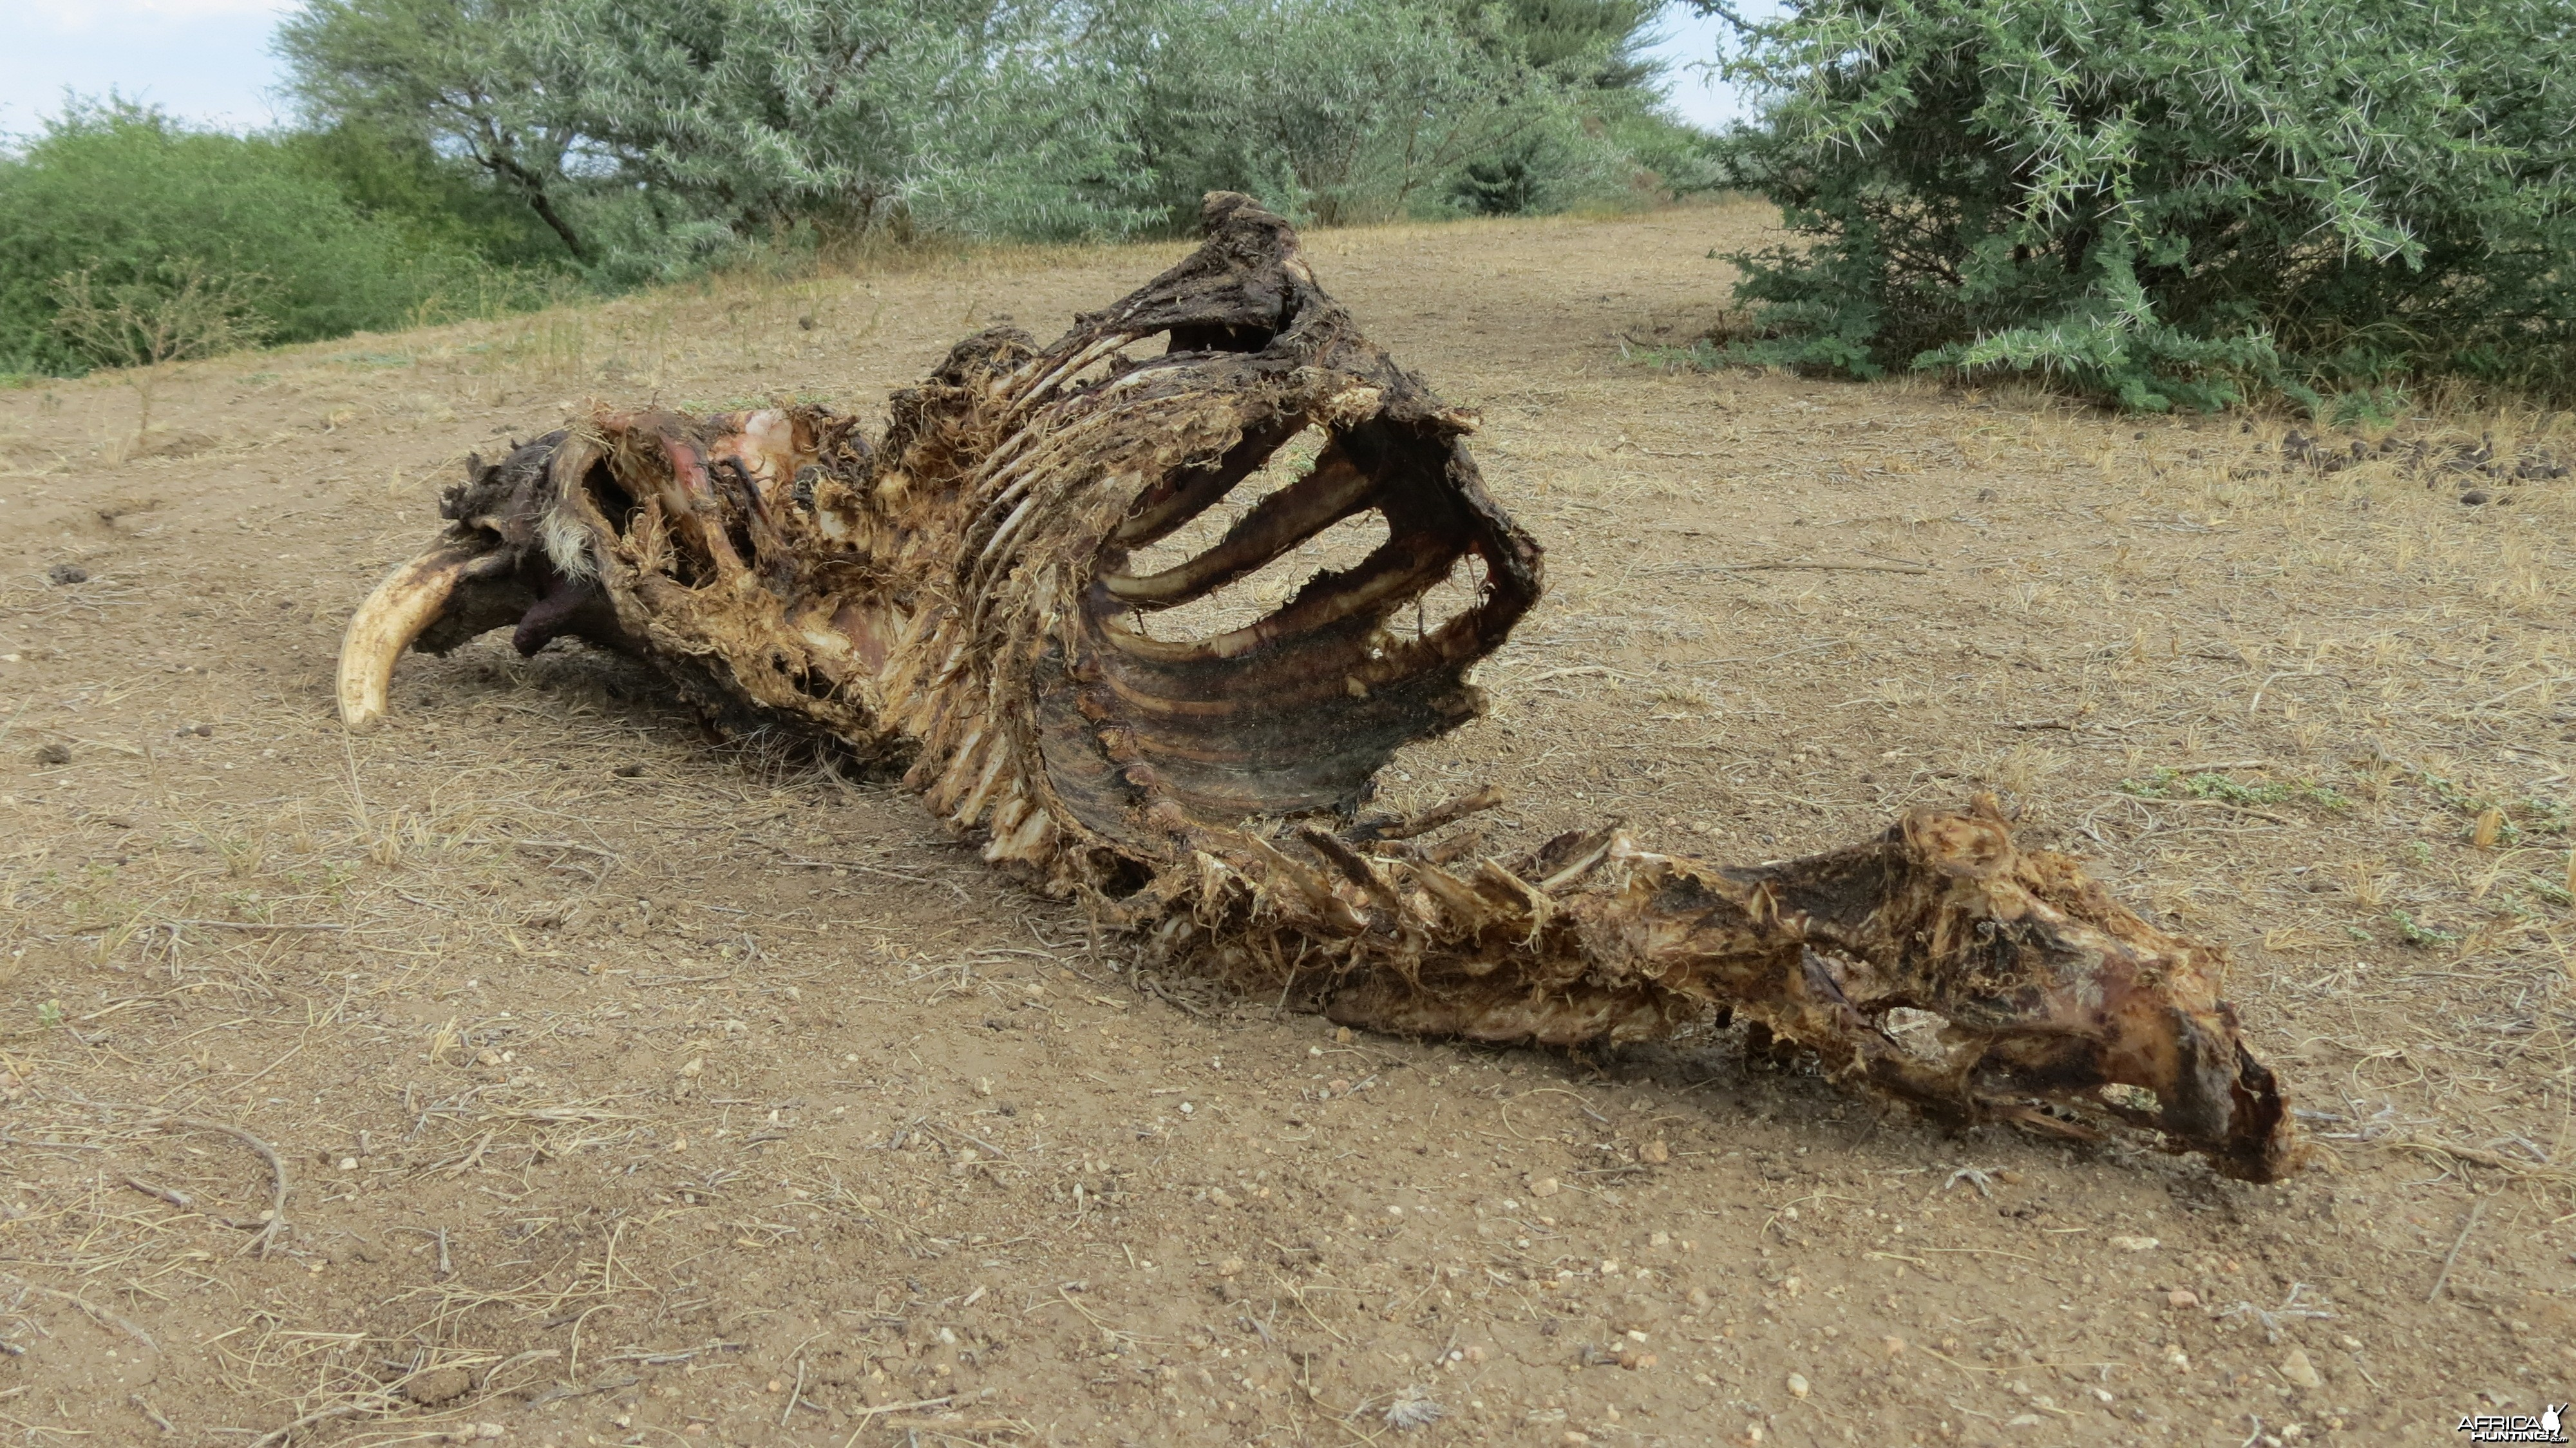 Warthog Carcass Namibia